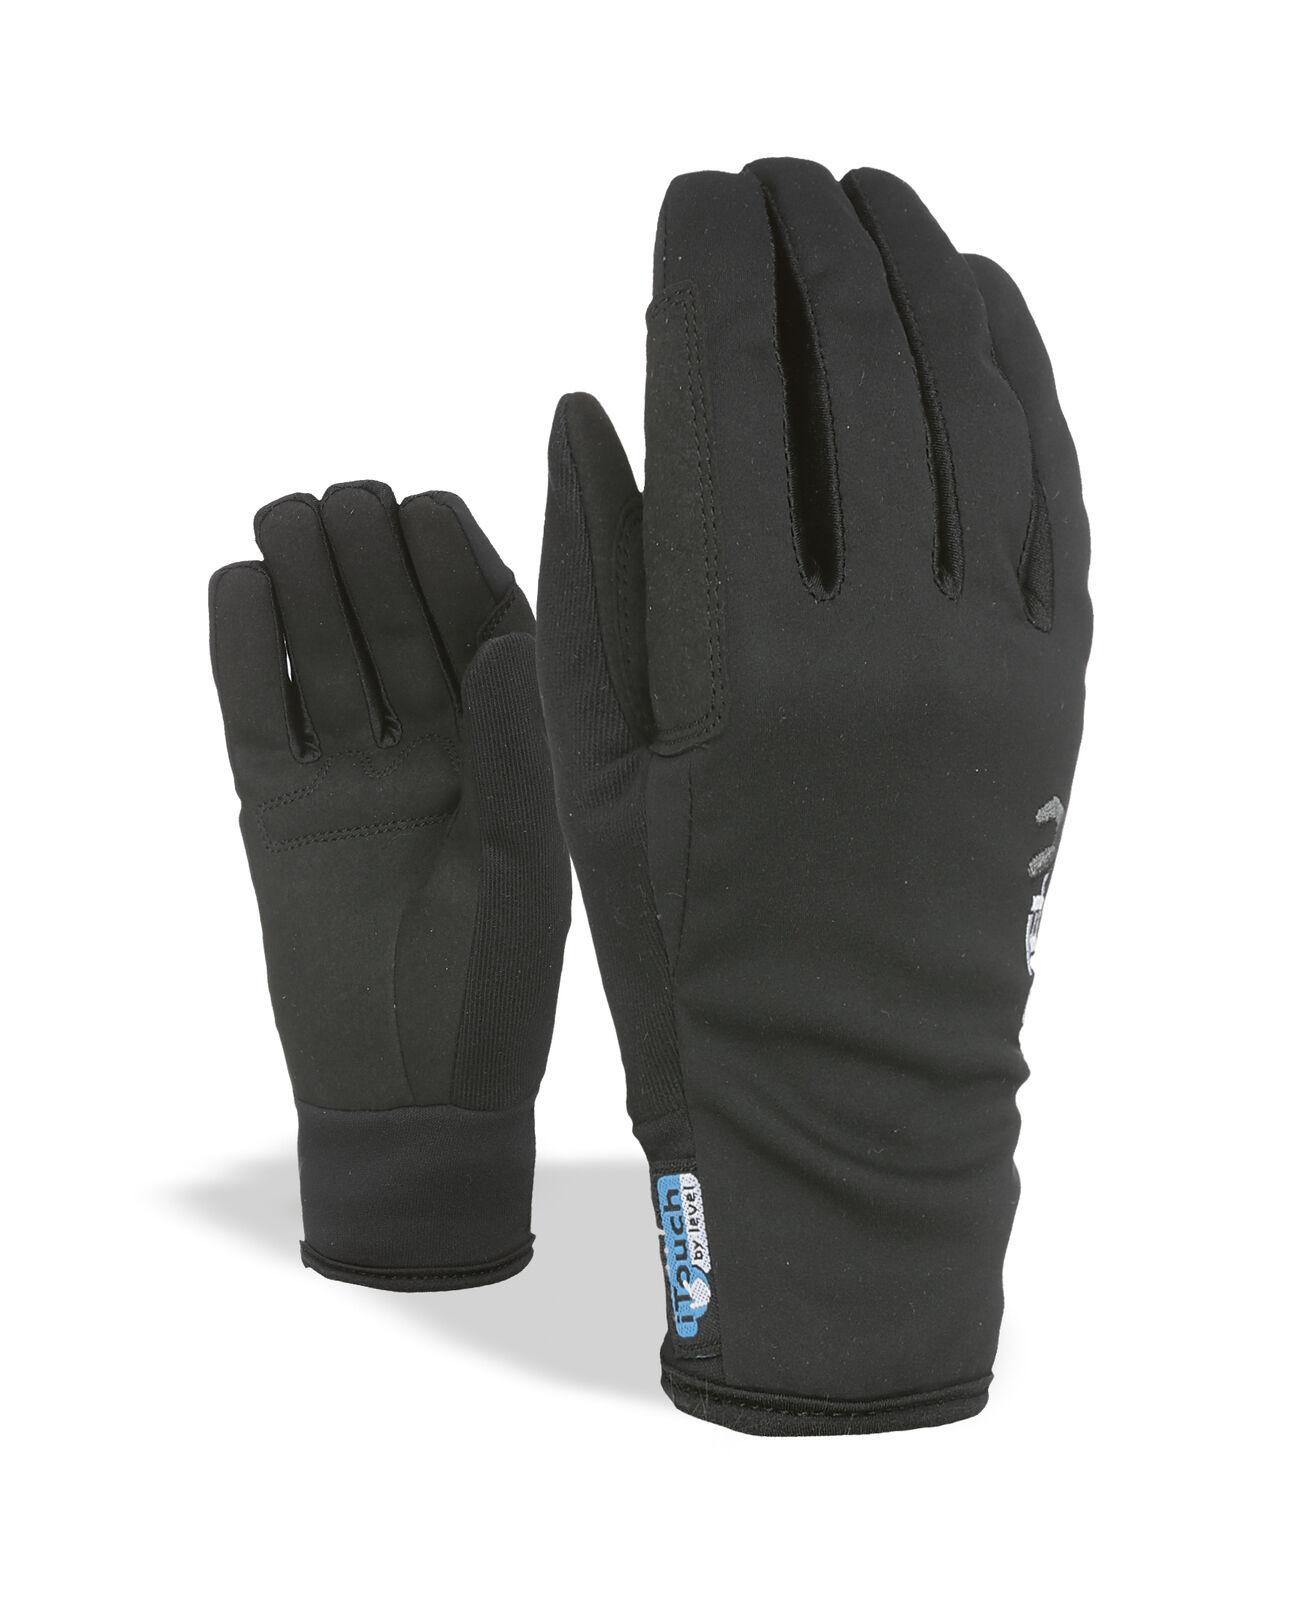 Level Handschuh Touring  black winddicht atmungsaktiv Unifarben  all goods are specials